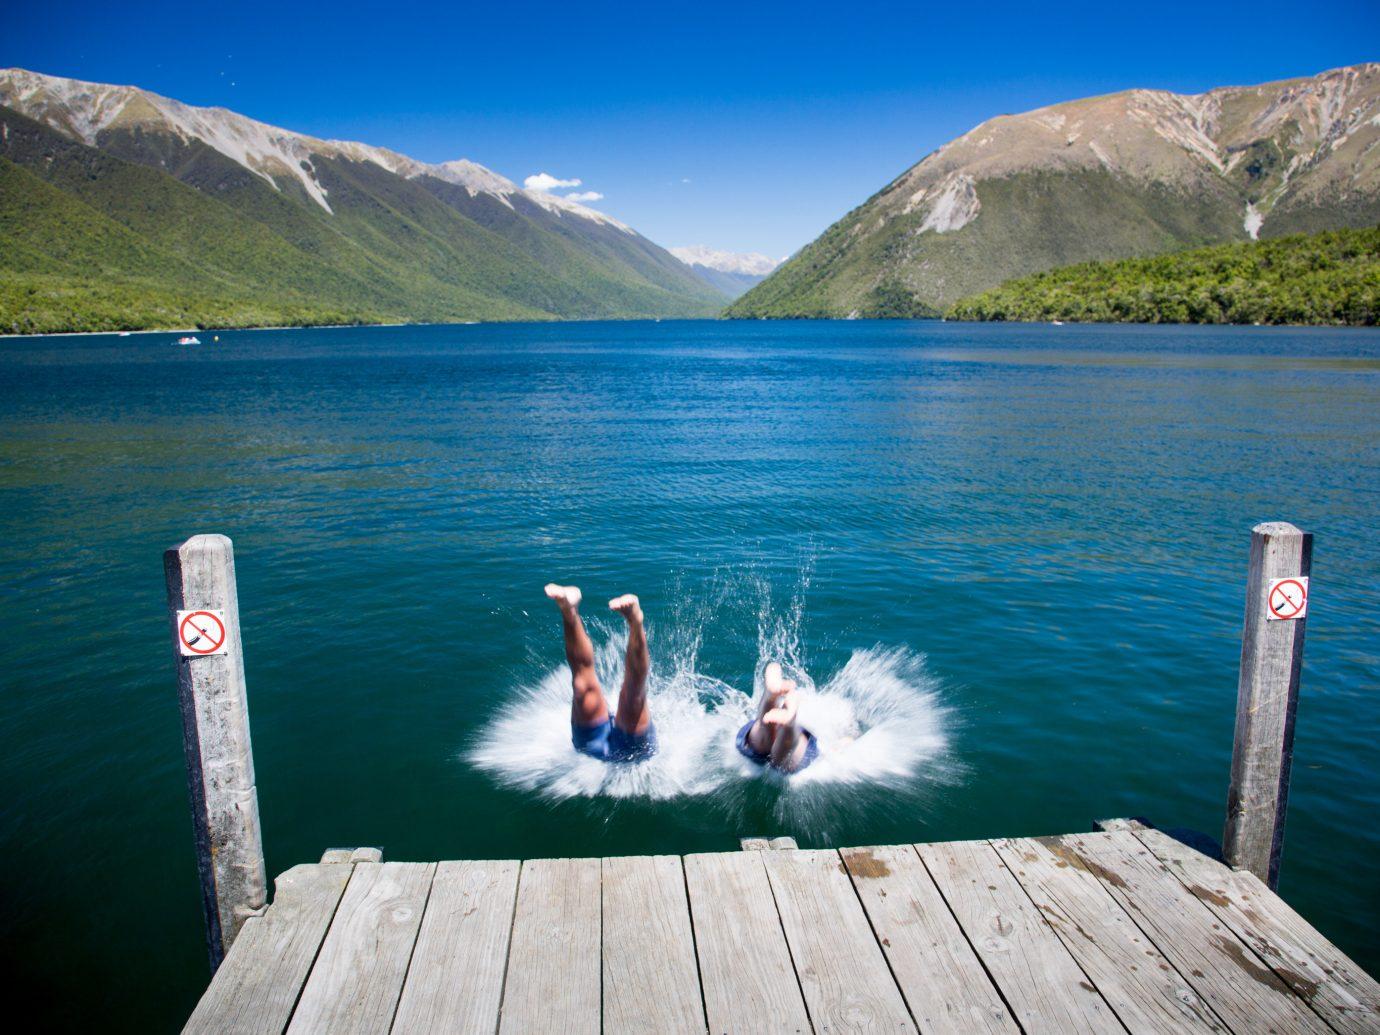 Trip Ideas water mountain sky outdoor Lake Sea vacation fjord wooden bay reflection reservoir mountain range